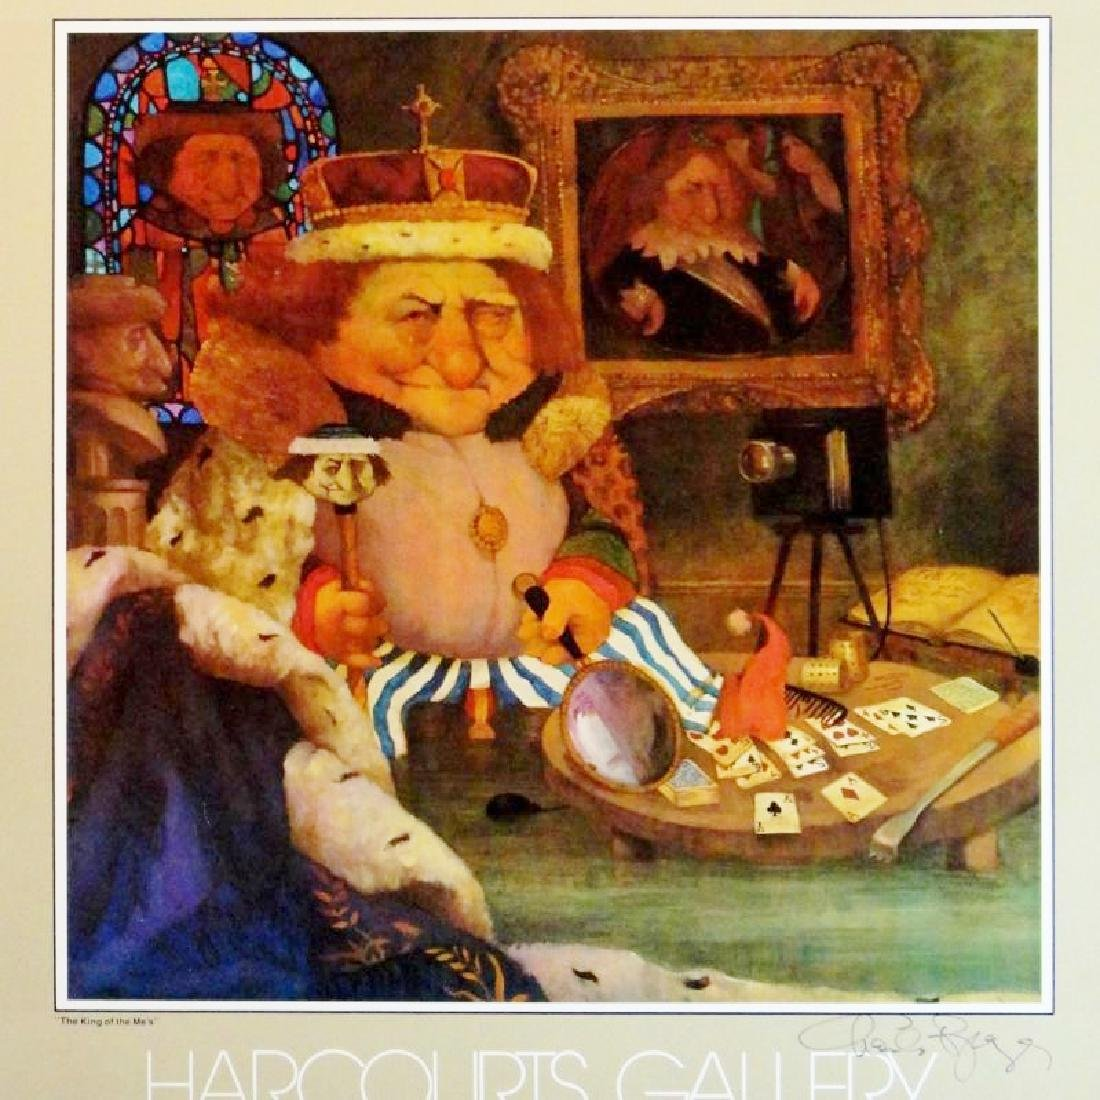 Charles Bragg Rare King Of Mes Litho Sale - 4